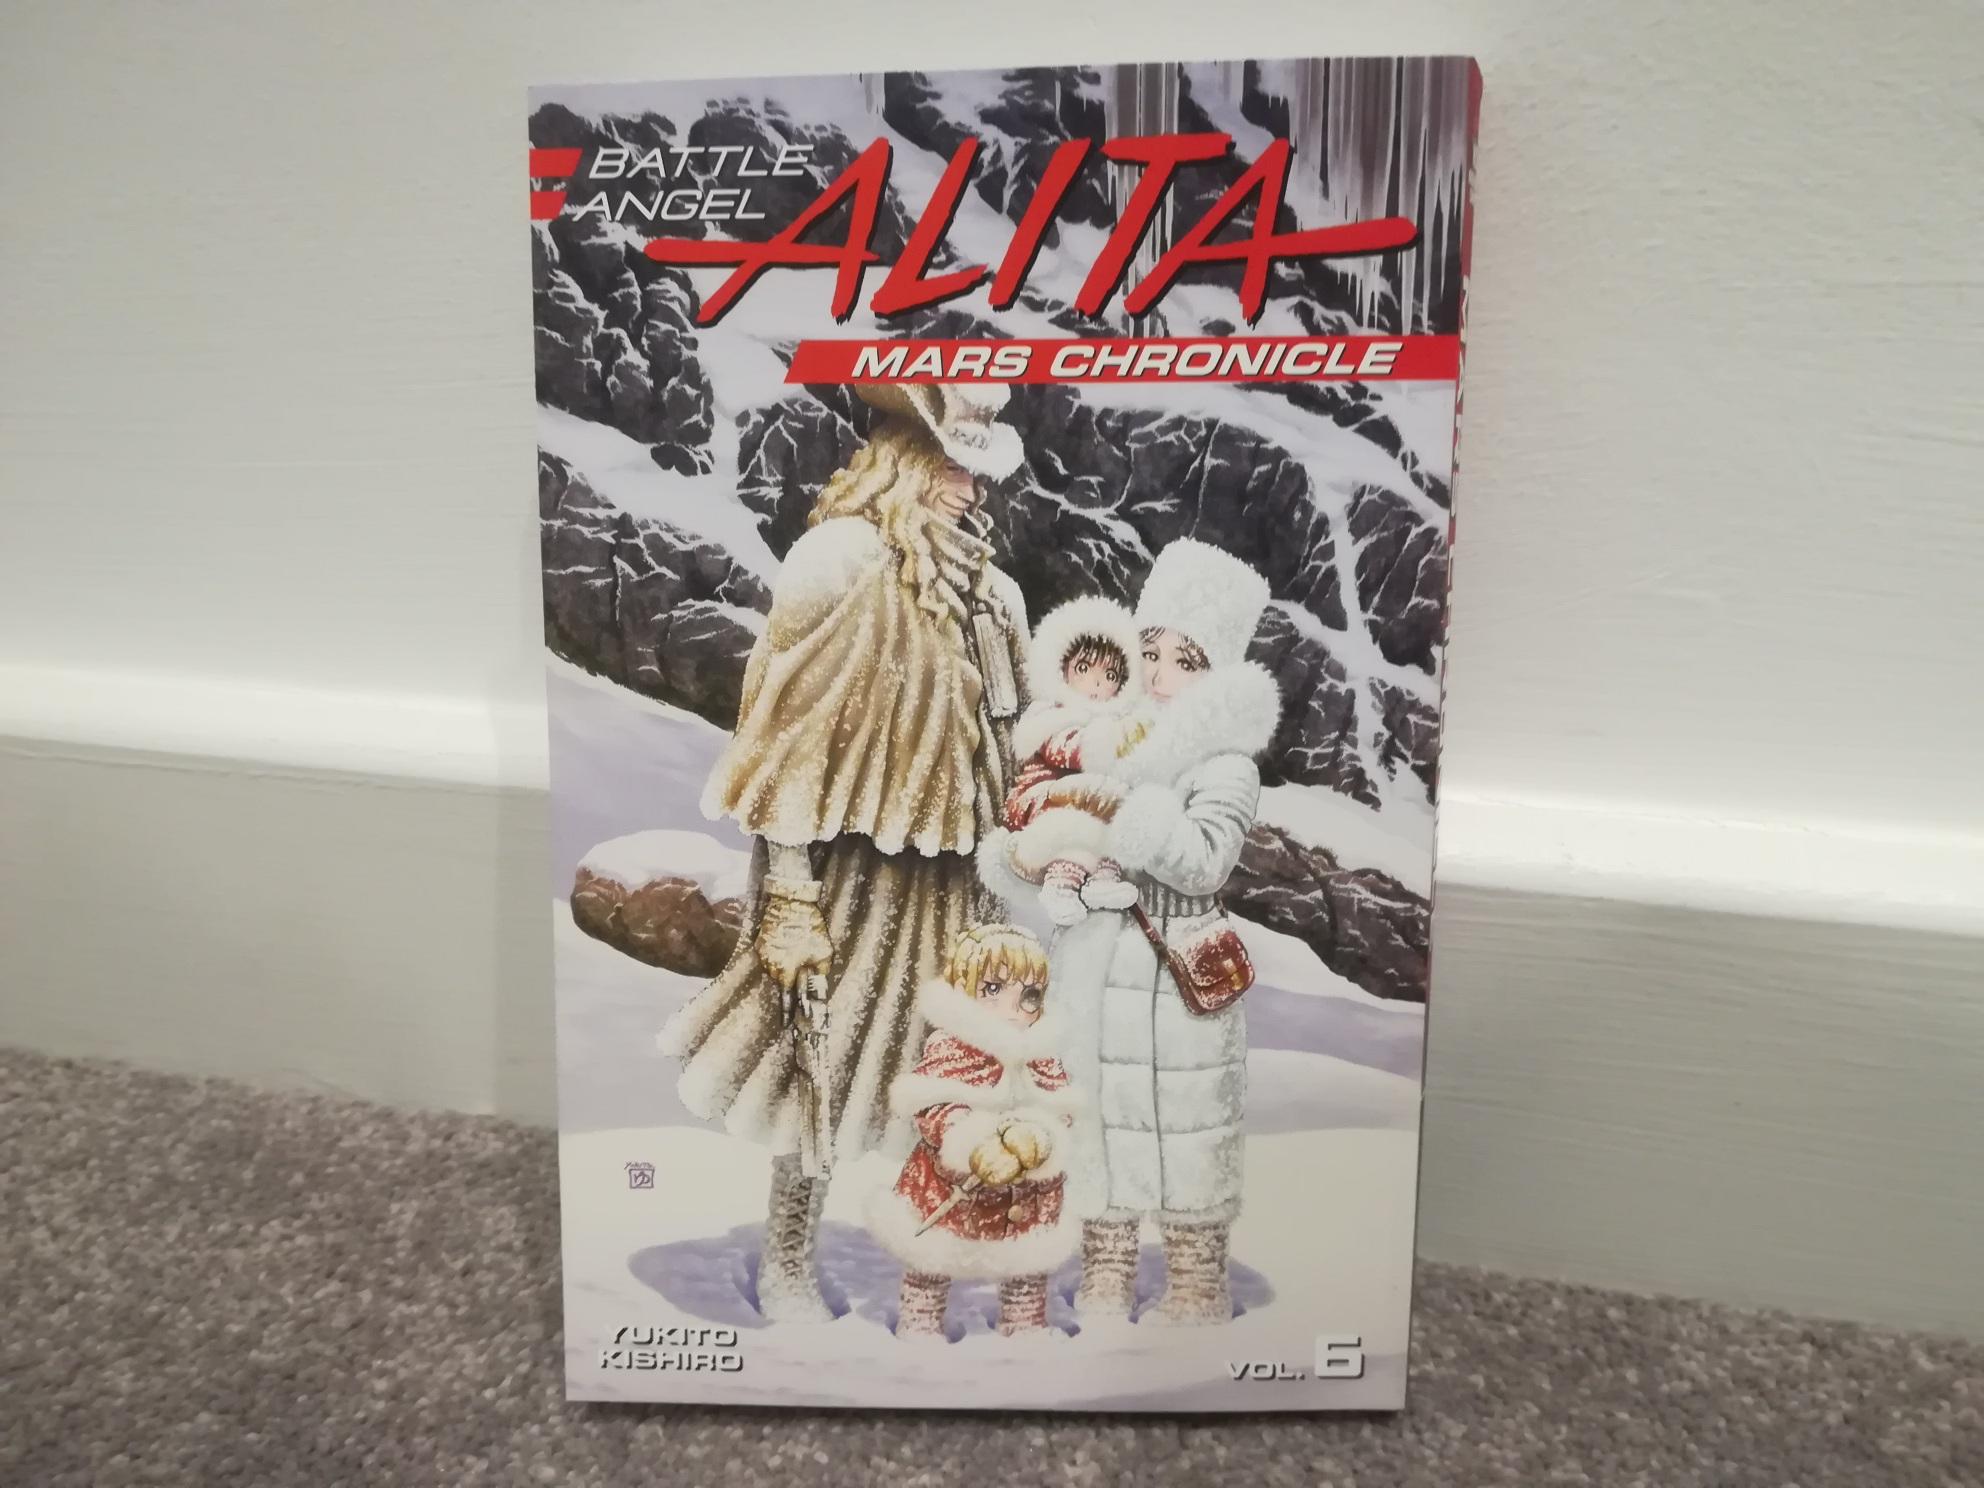 Battle Angel Alita: Mars Chronicle Vol. 6